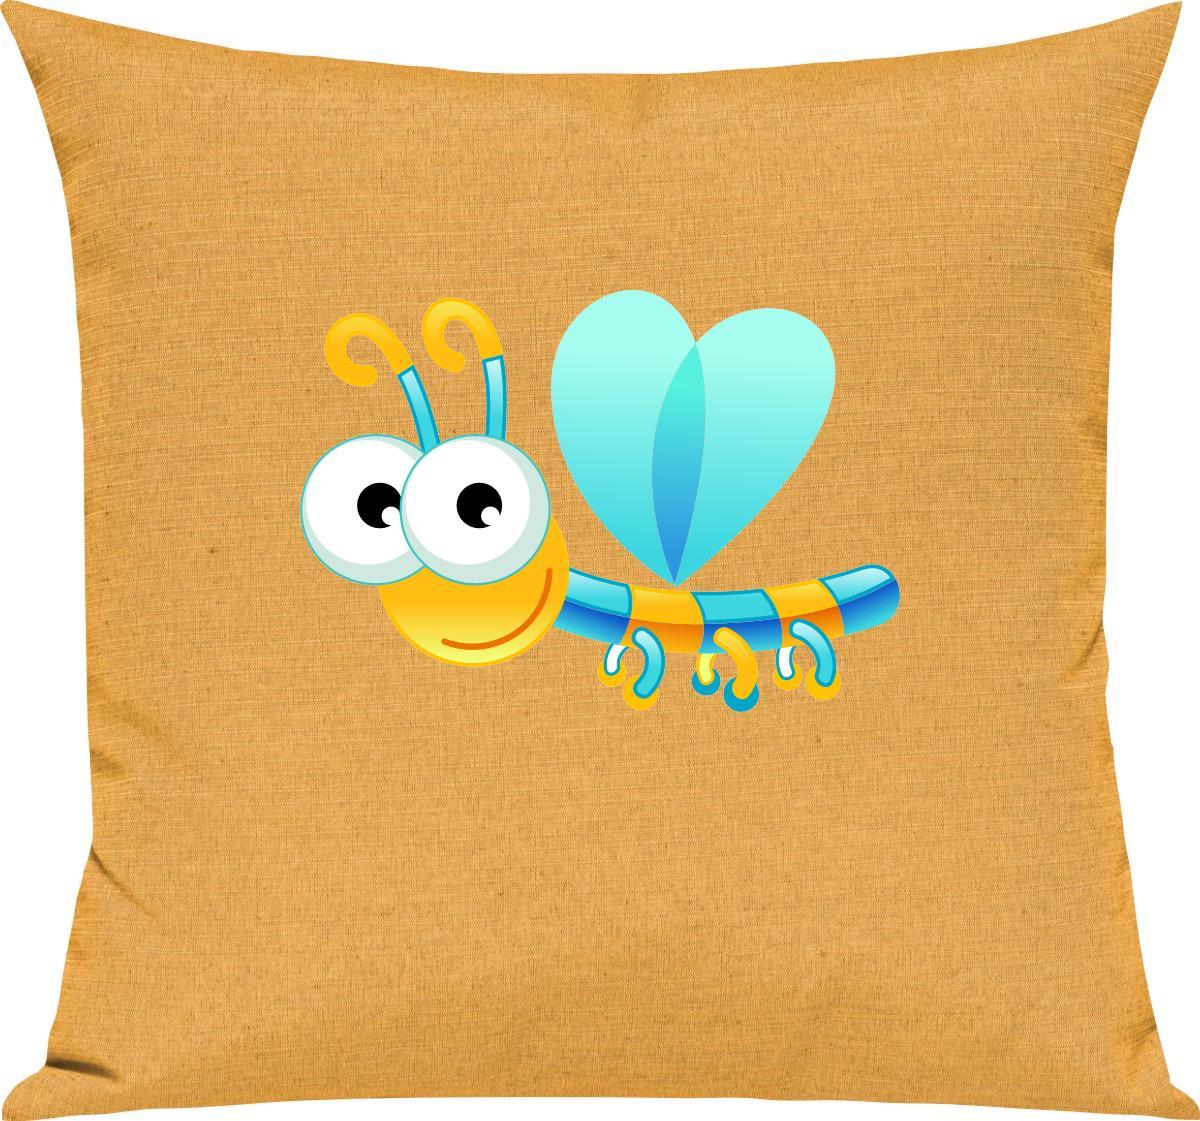 Indexbild 6 - Kinder Kissen, Libelle Insekt Tiere Tier Natur, Kuschelkissen Couch Deko,